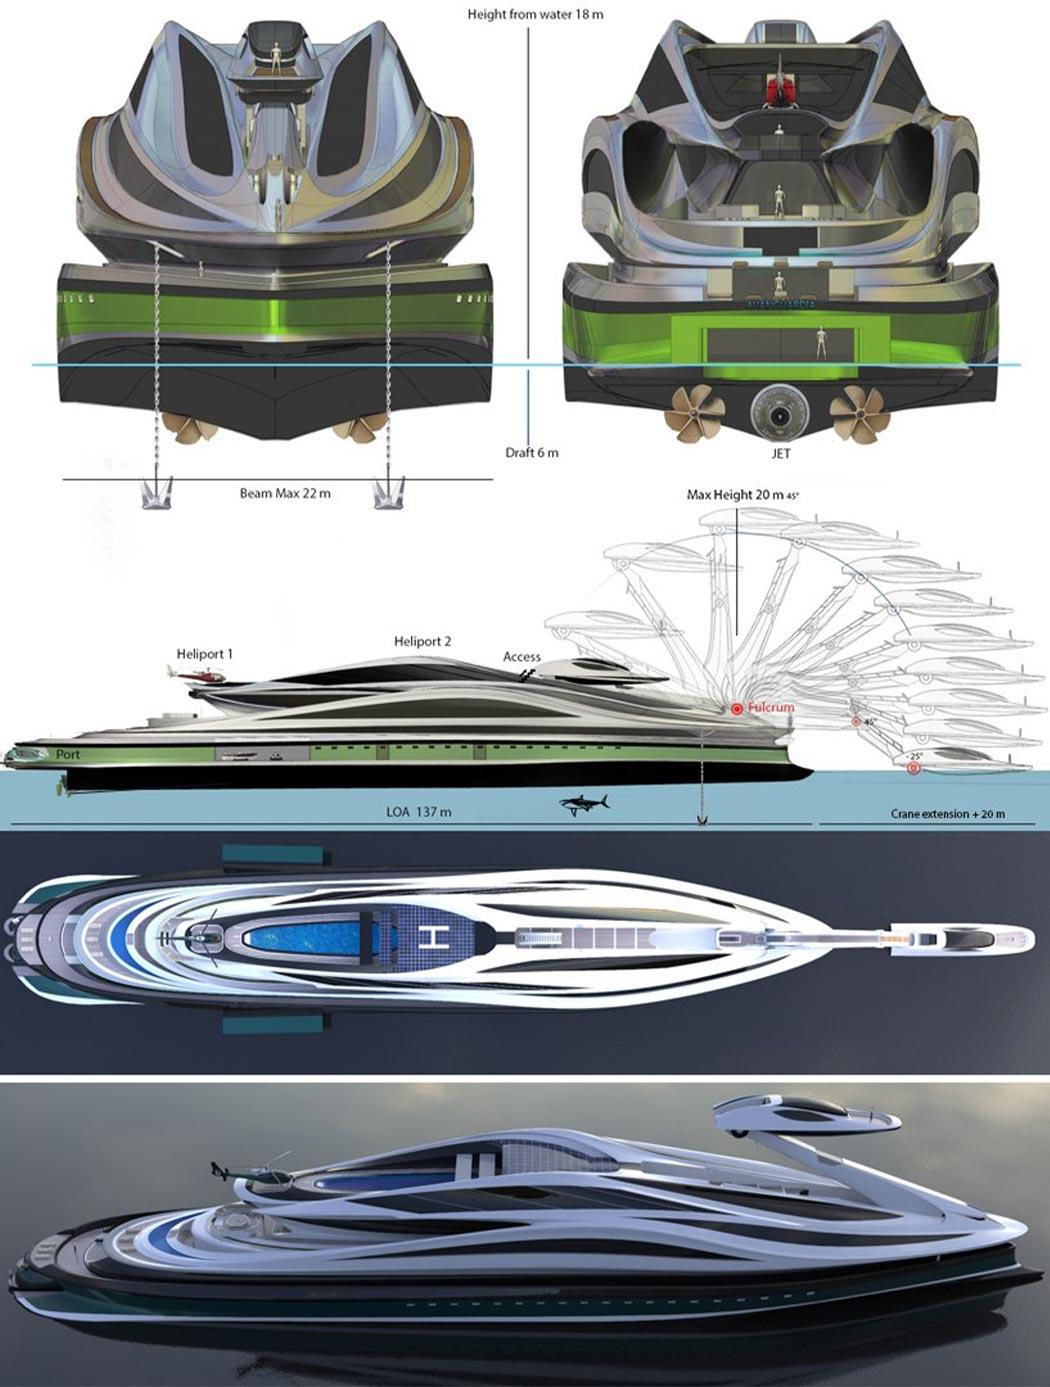 هزینه هنگفت قایق تفریحی مفهومی طرح قو معادل 500 میلیون دلار